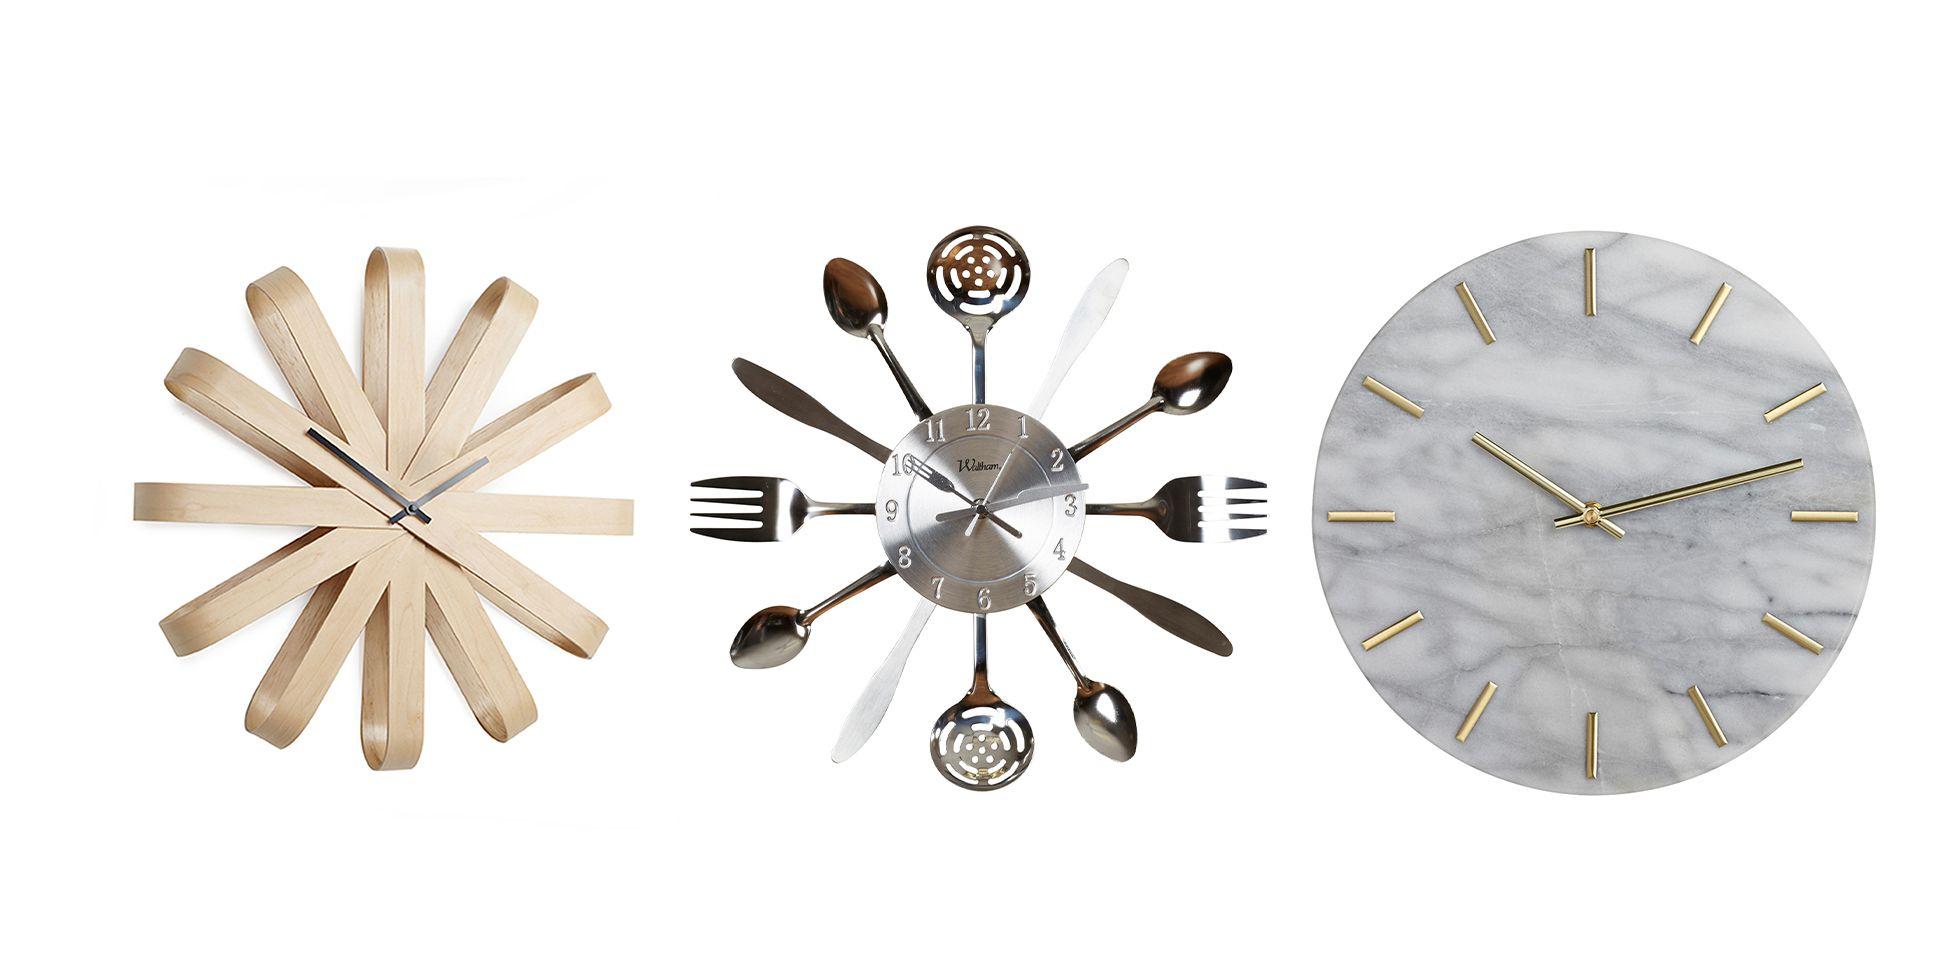 kitchen clocks kids appliances 15 best wall stylish clock ideas for kitchens